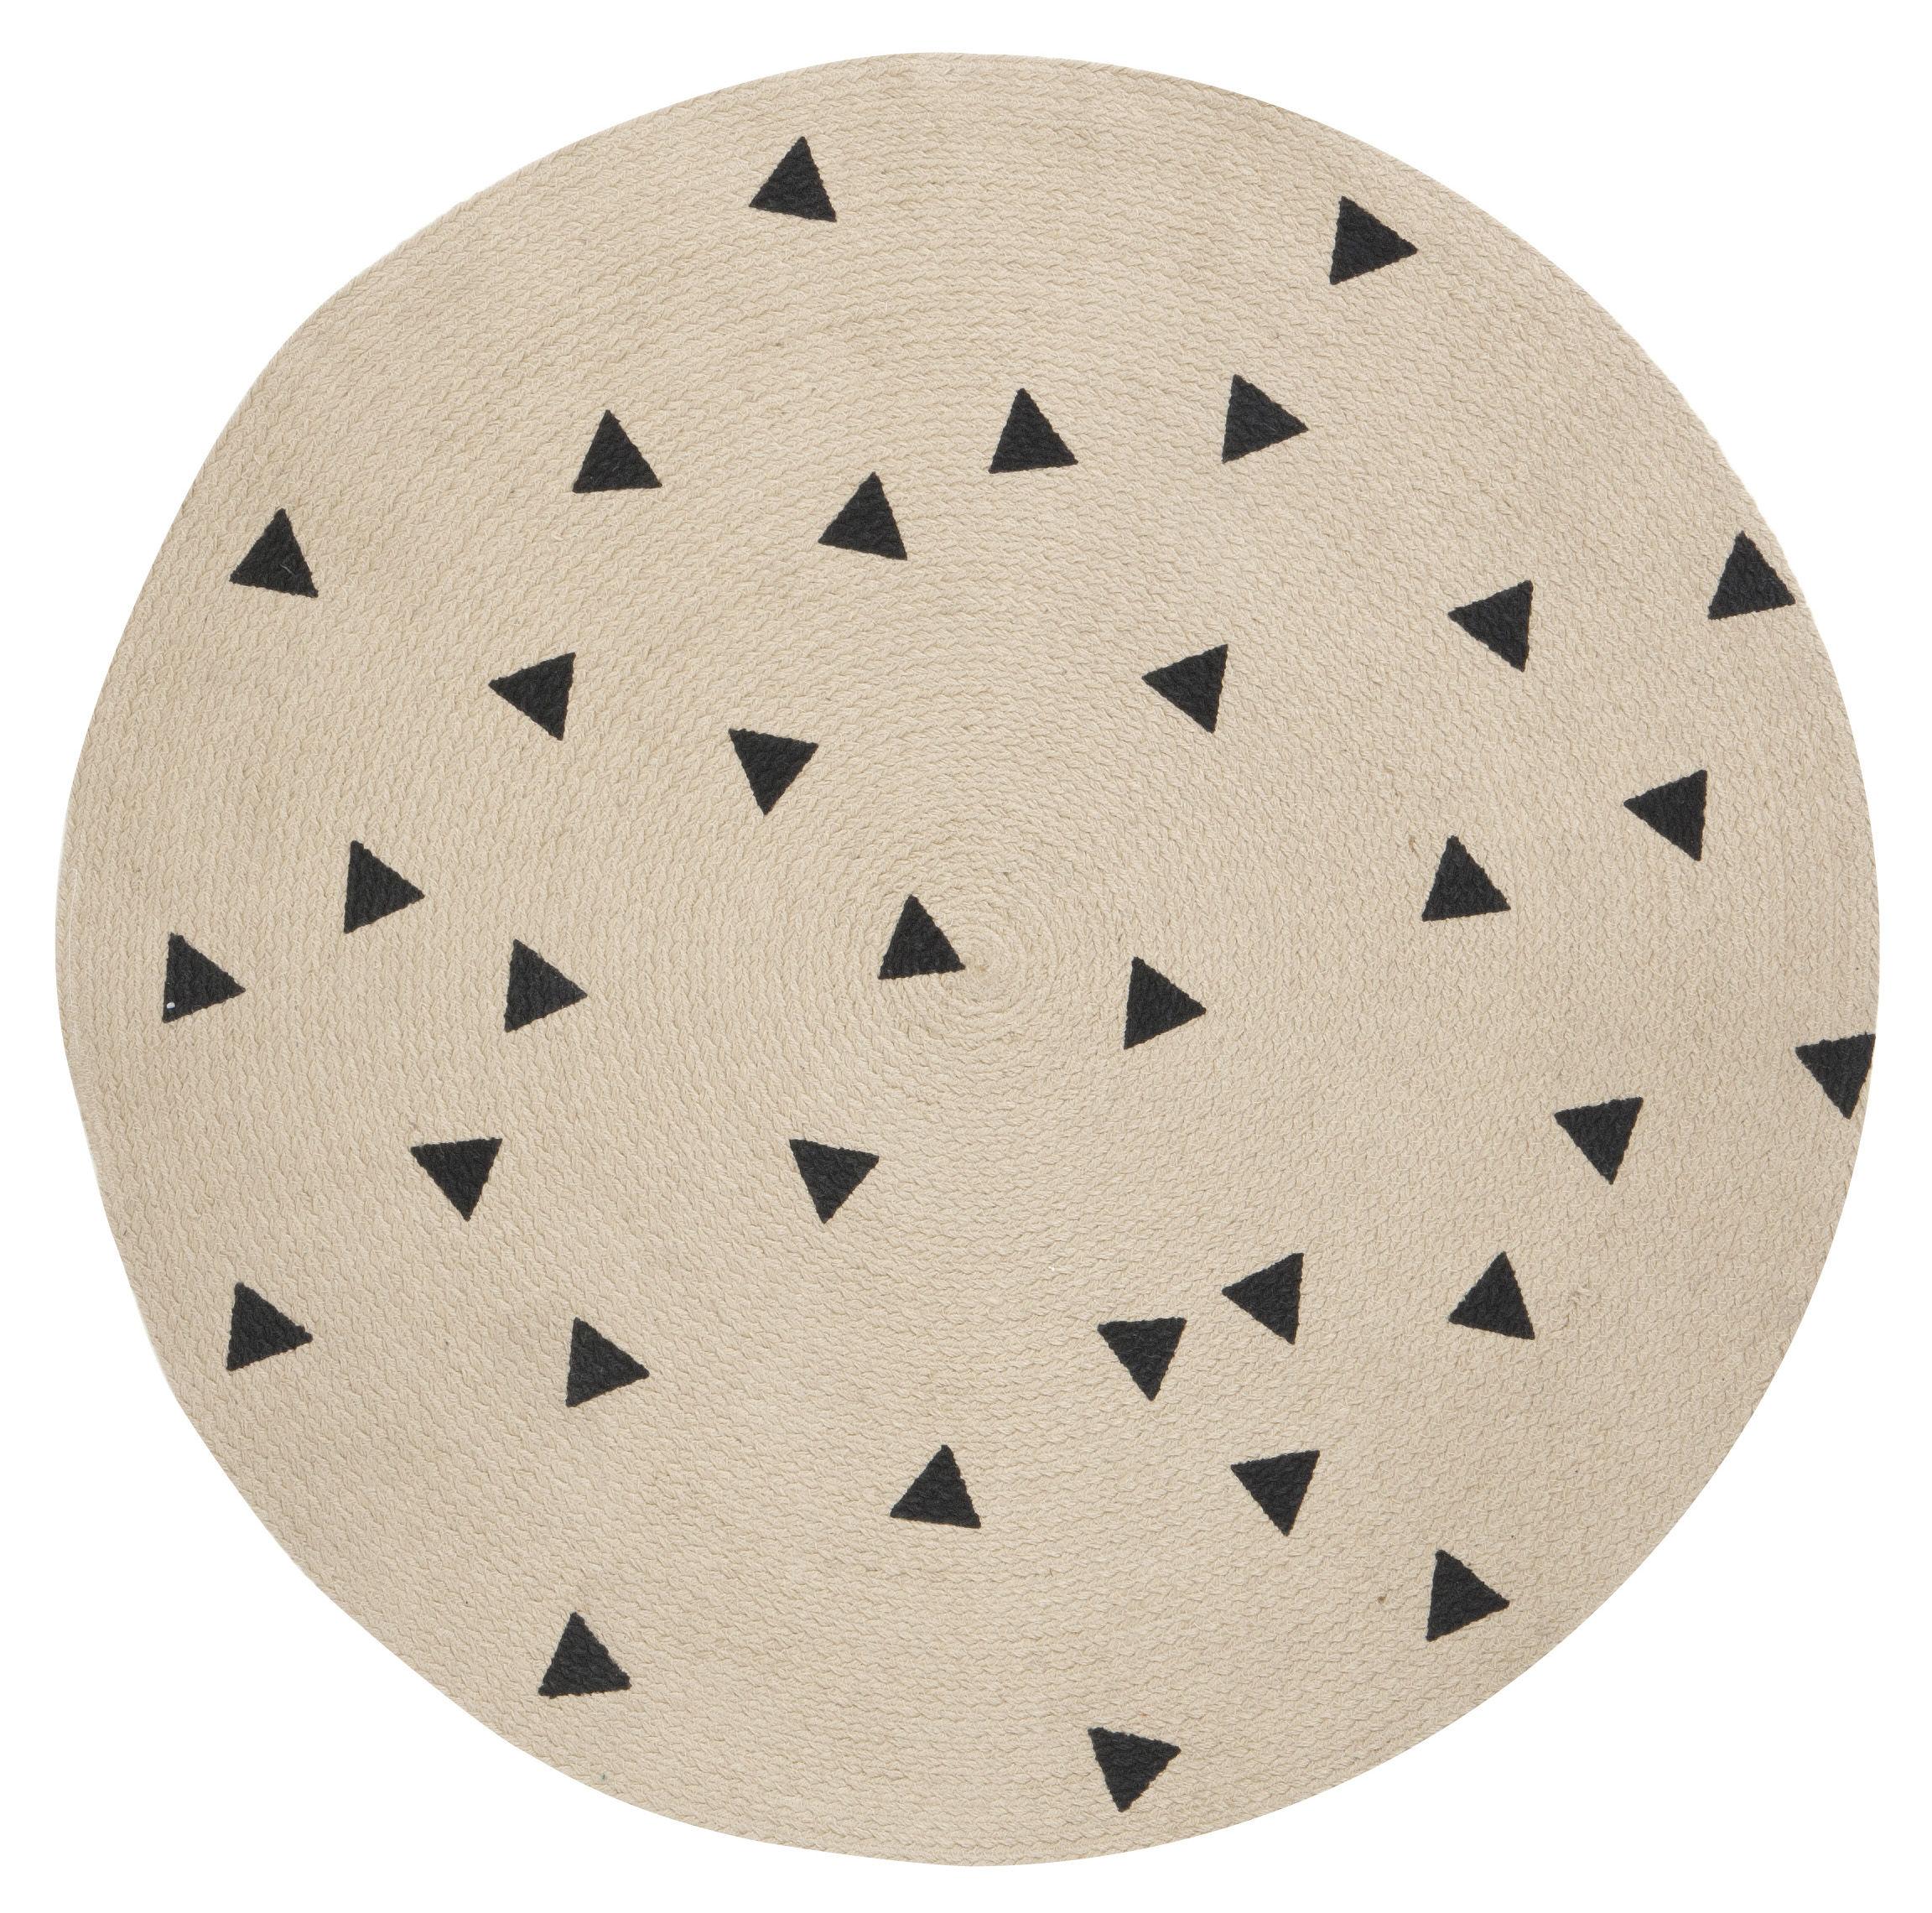 Dekoration - Teppiche - Triangles Teppich / Ø 100 cm - Ferm Living - Schwarz / Dreiecke - Jute